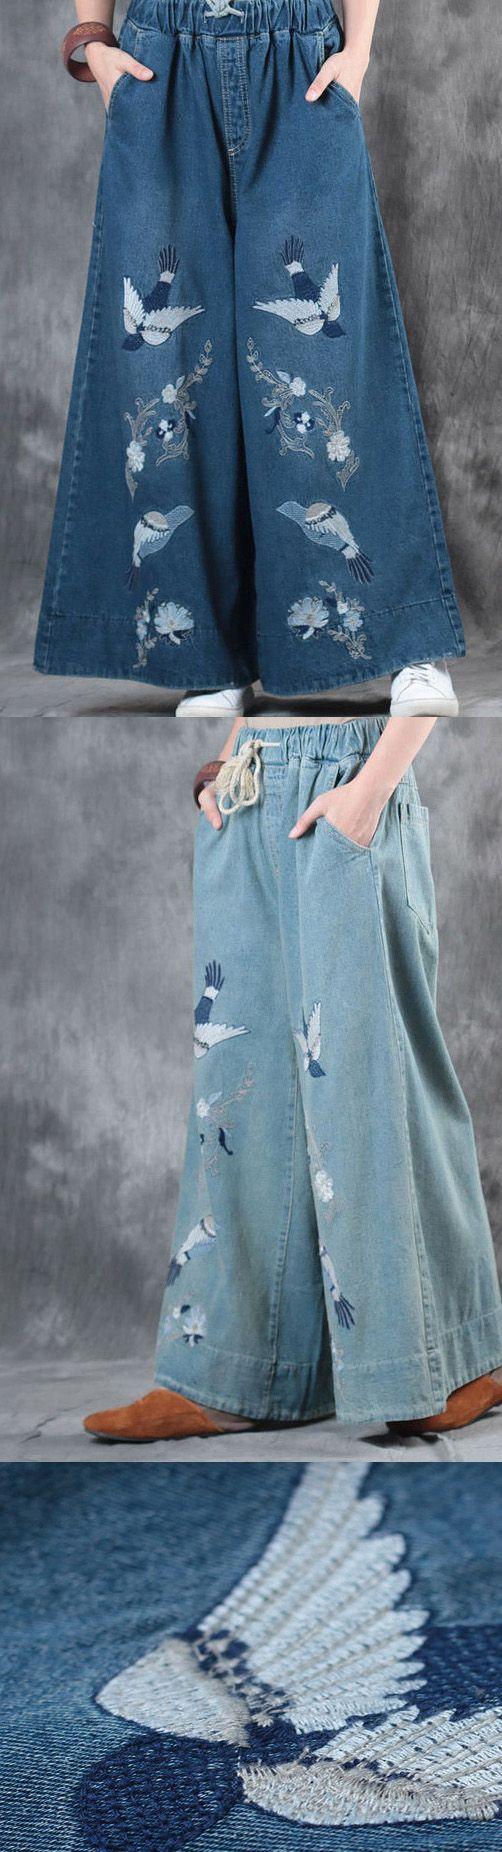 2017 denim darl blue embroidery pants plus size elastic waist vintage wide leg pants